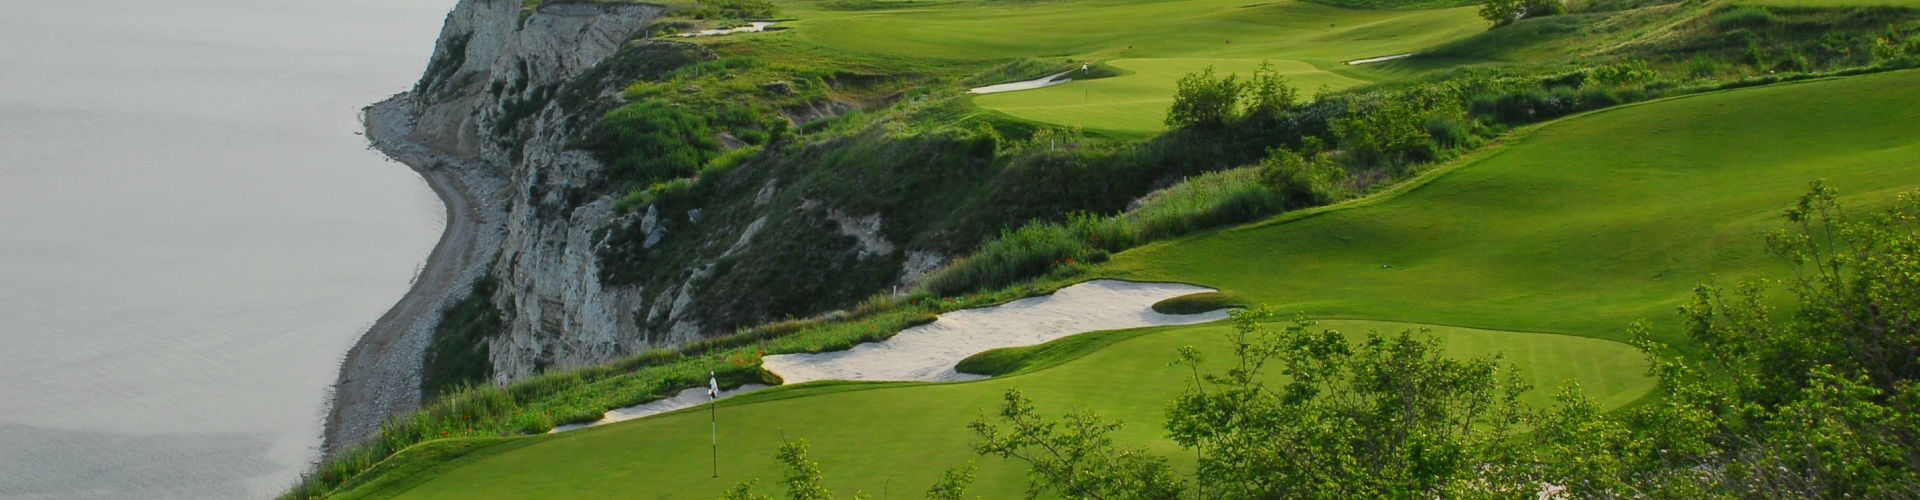 Golfresor Bulgarien - golfreseguiden.se